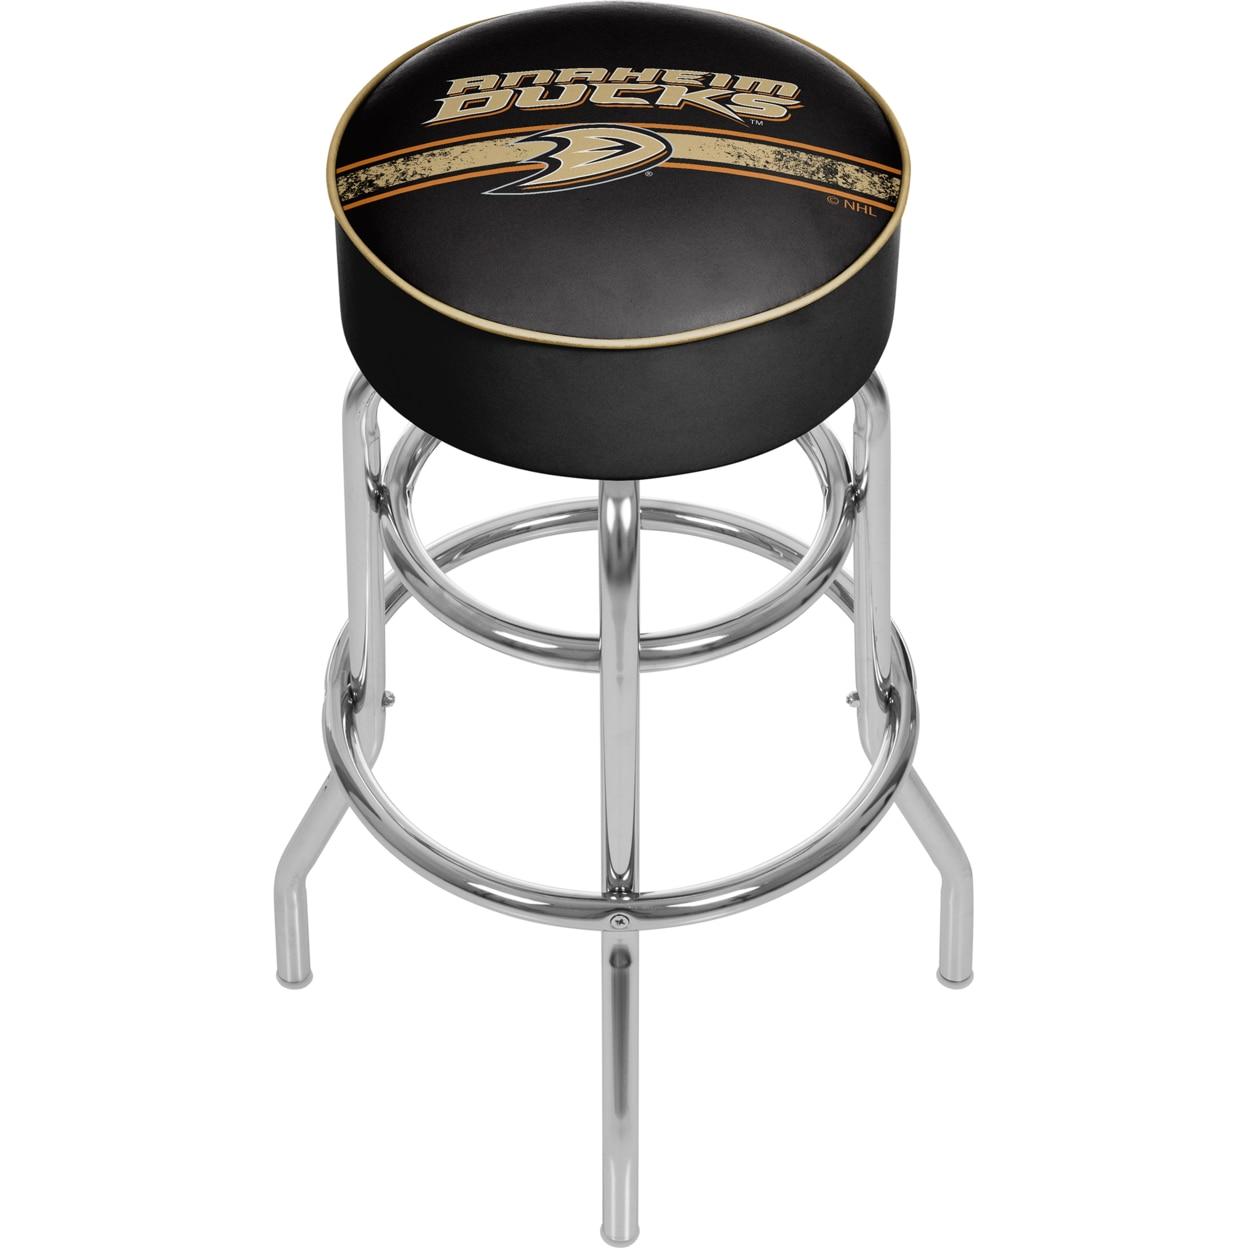 NHL Chrome 30 Inch Bar Stool with Swivel - Anaheim Ducks купить nhl 10 на xbox